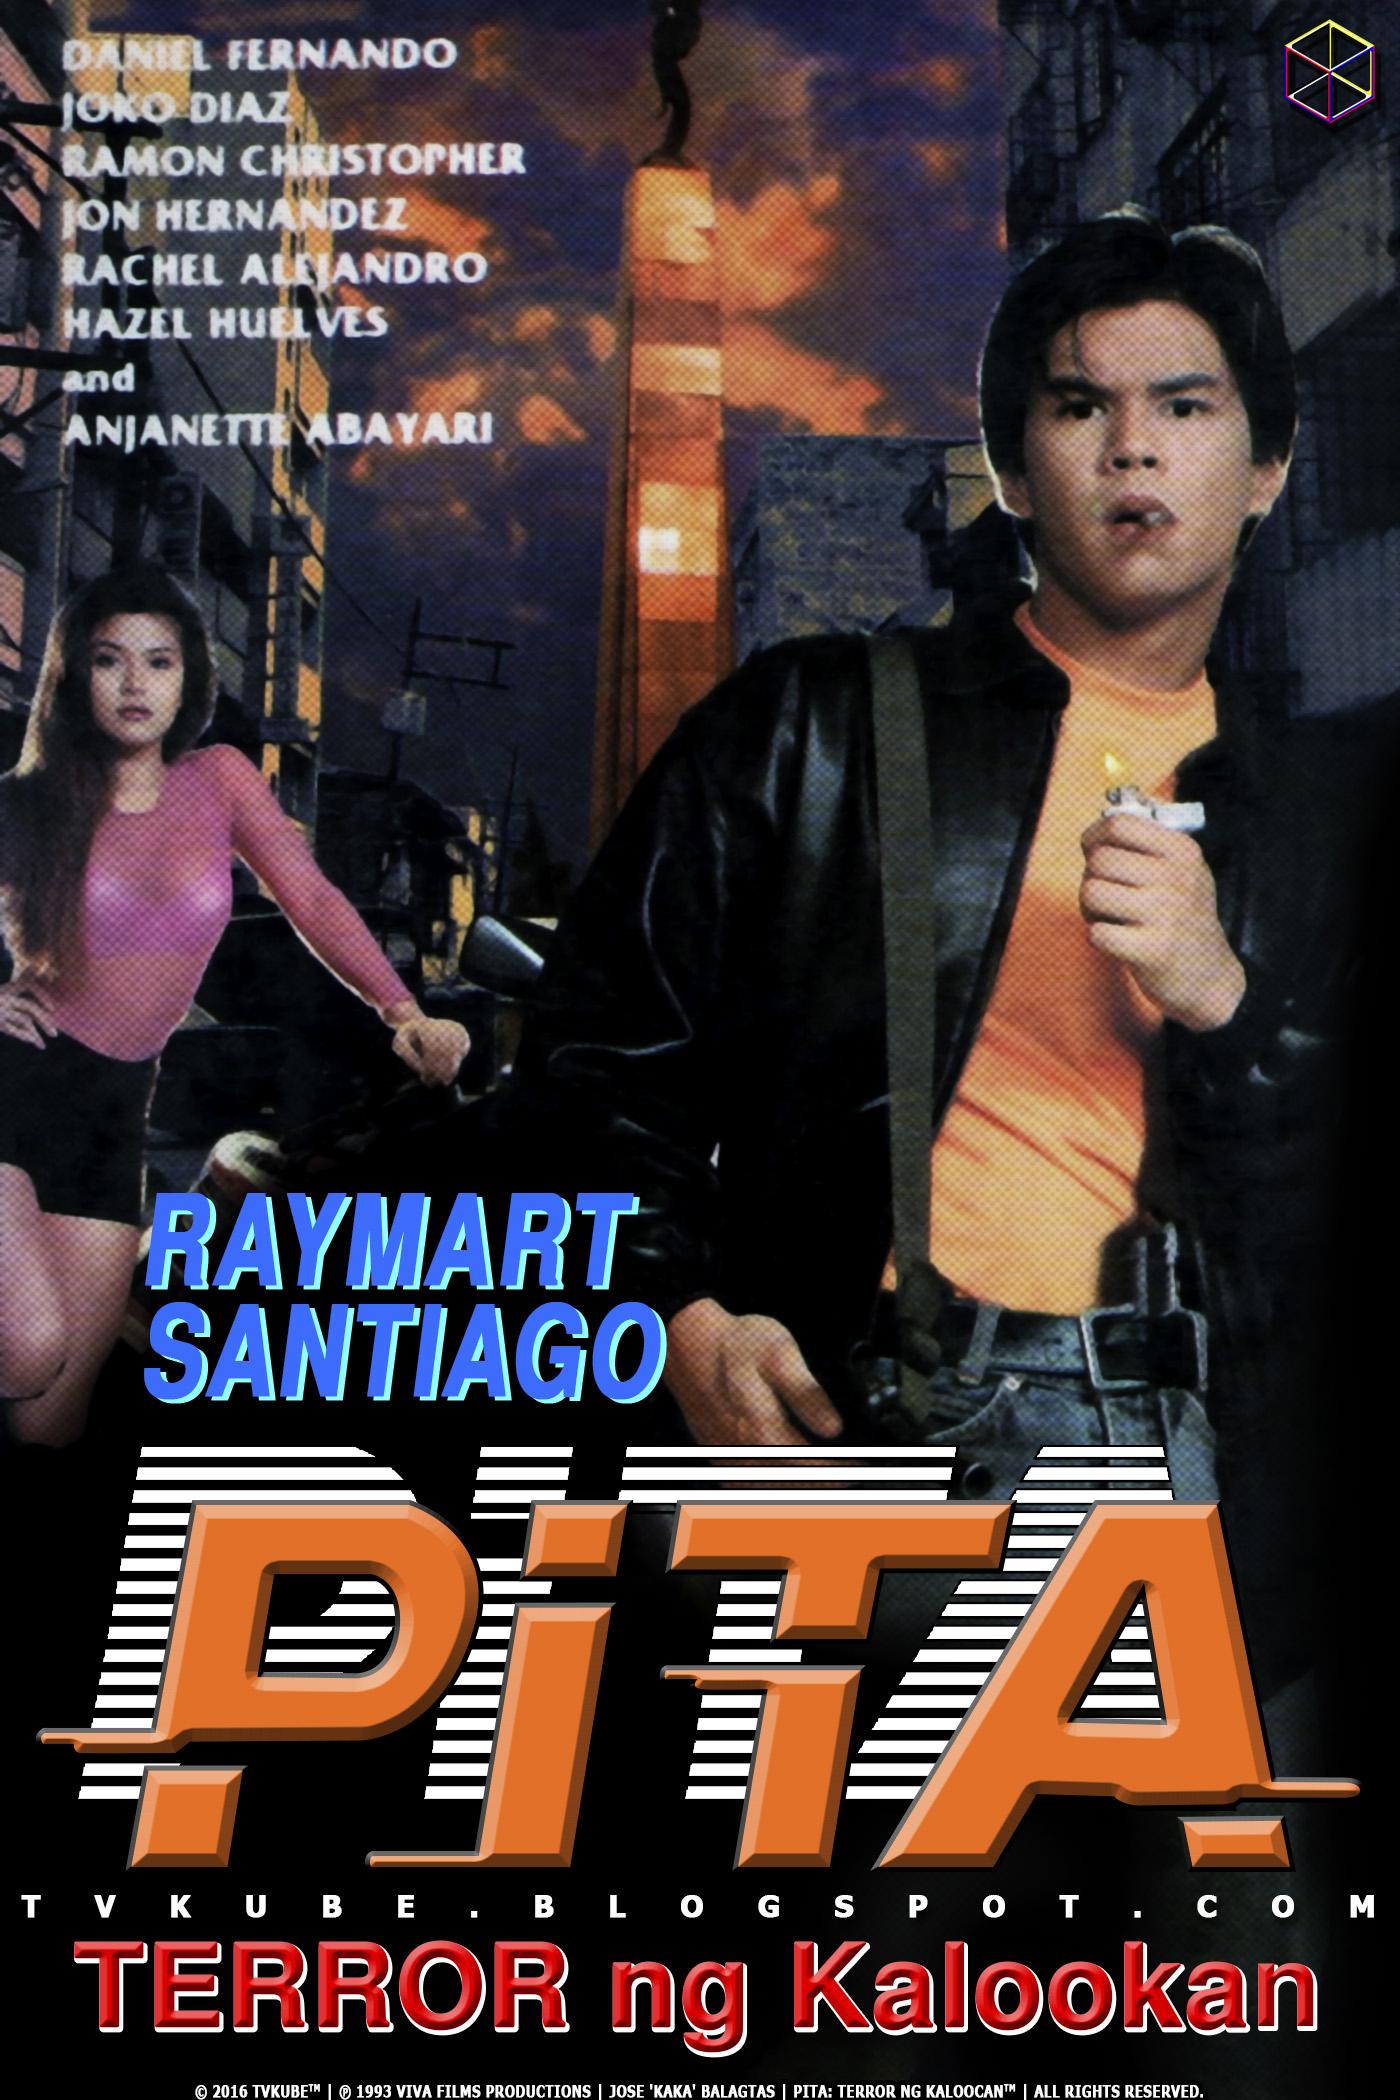 raymart santiago dating historie